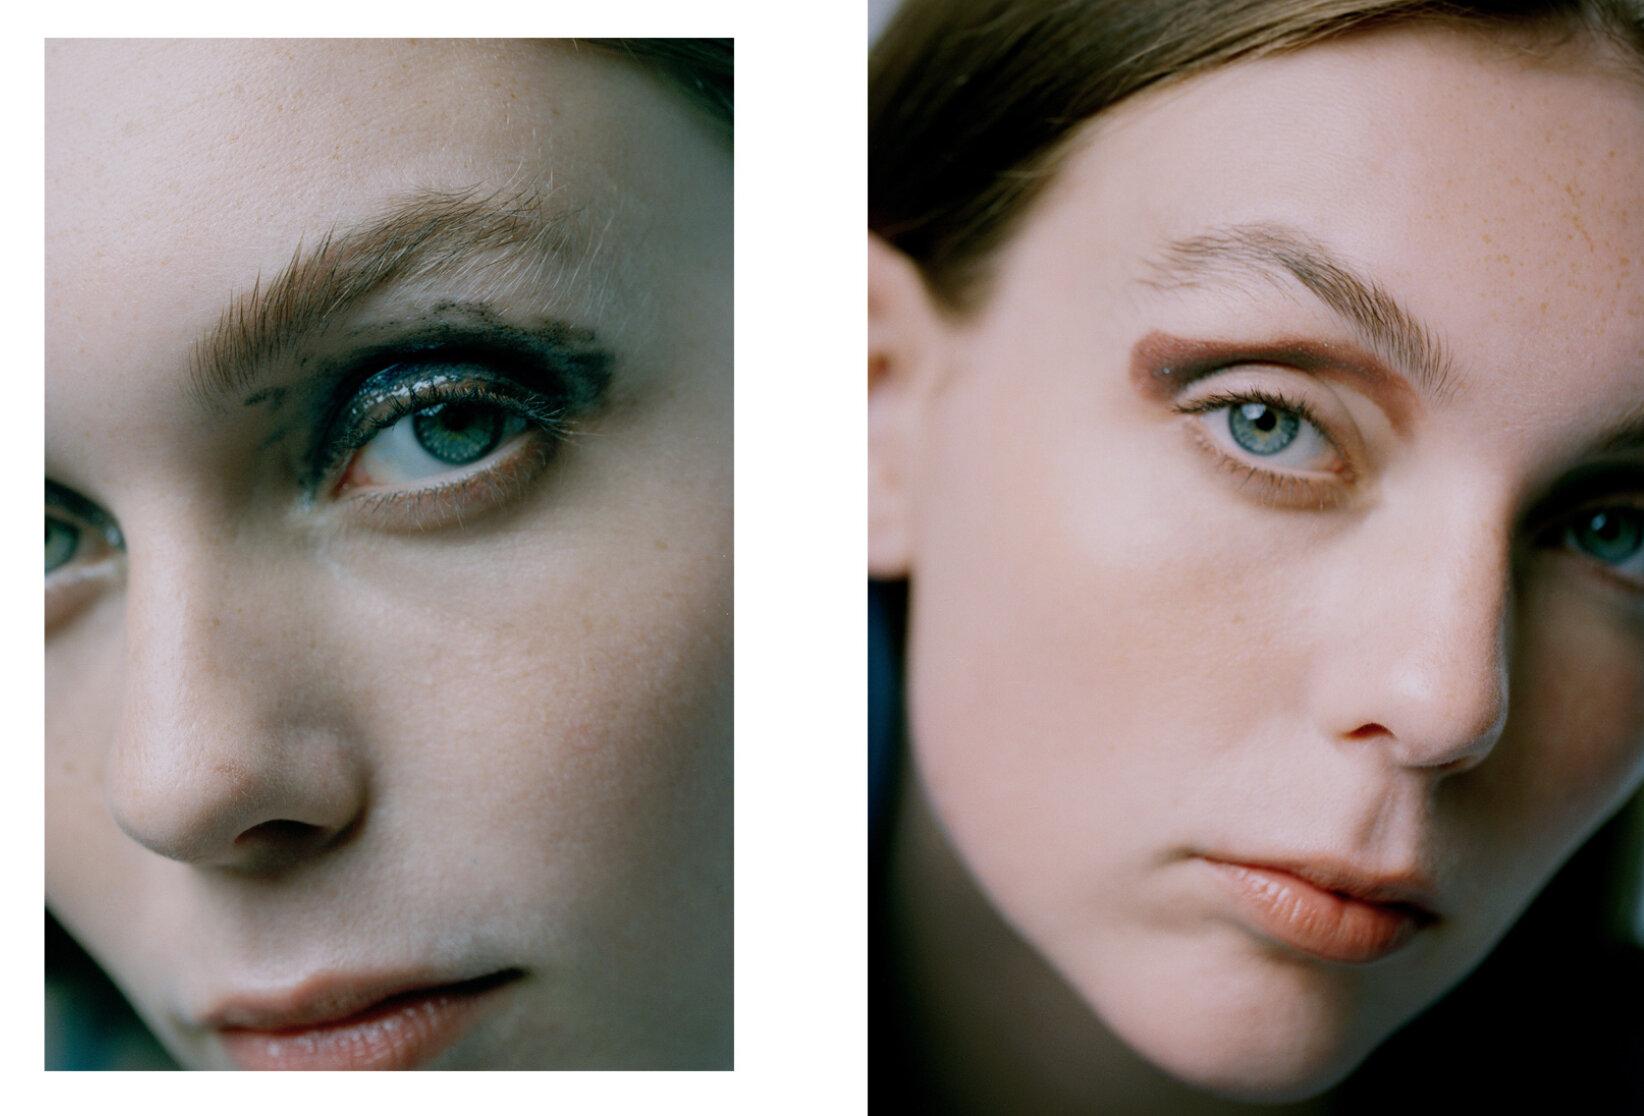 Photographer  Valerie Yuwen Hsieh  / Hair & Make Up  Melanie Christou  / Model  Amelia Grace  from Premier Model Agency